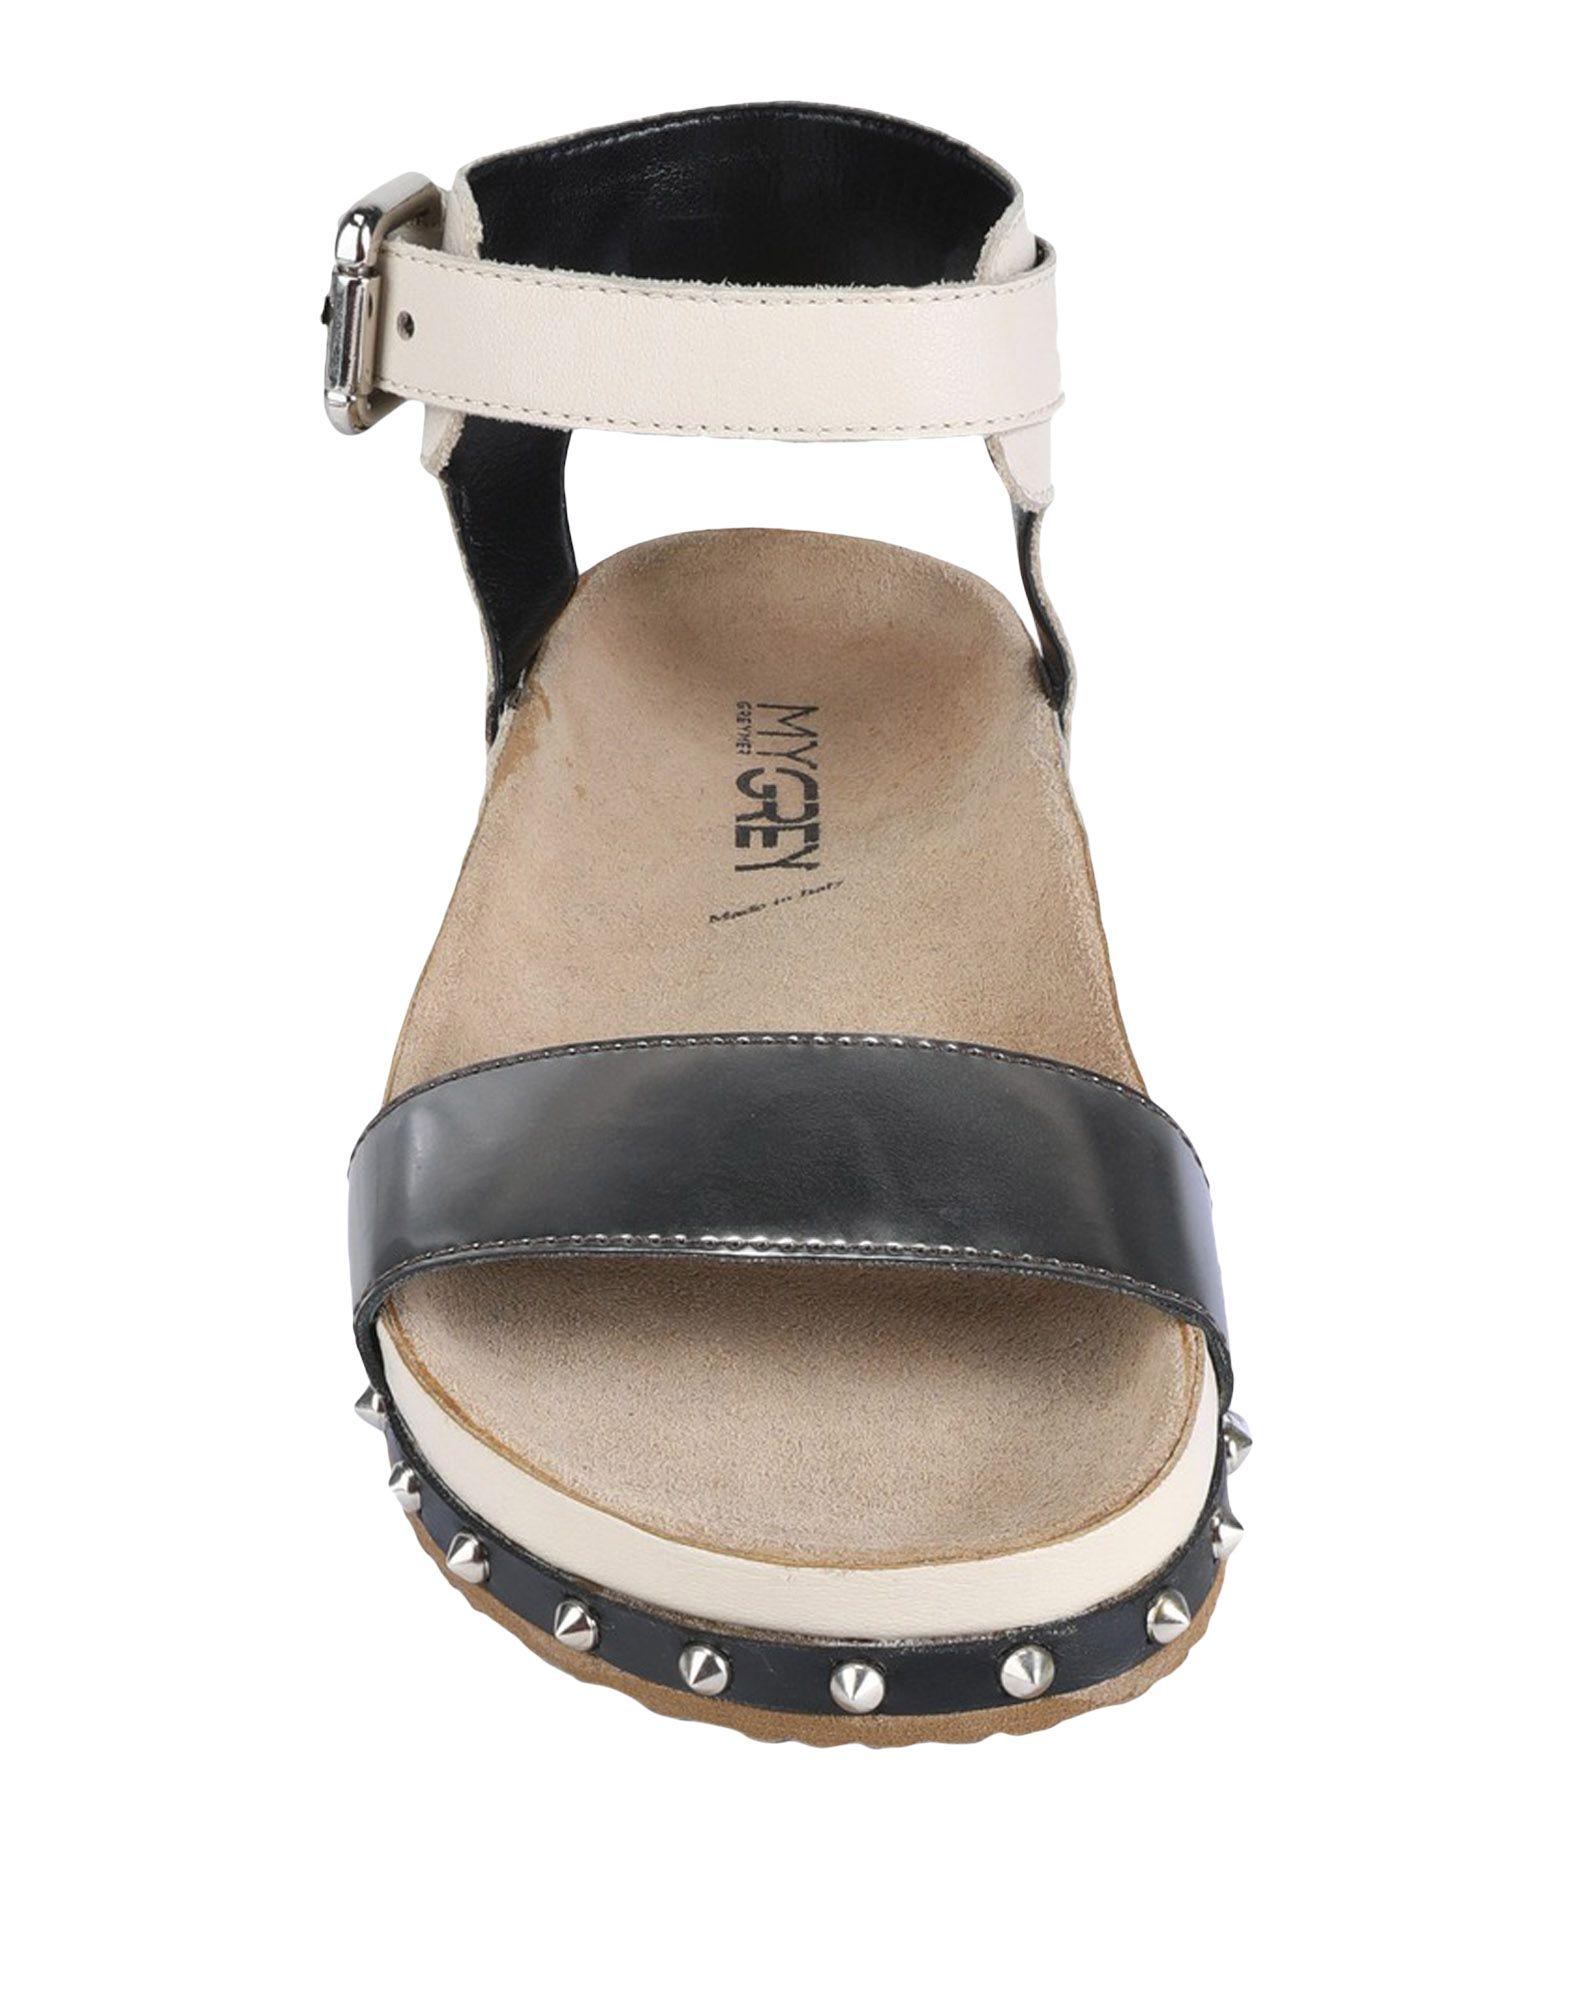 My Grey Sandalen Damen  beliebte 11525806BK Gute Qualität beliebte  Schuhe 7e339c